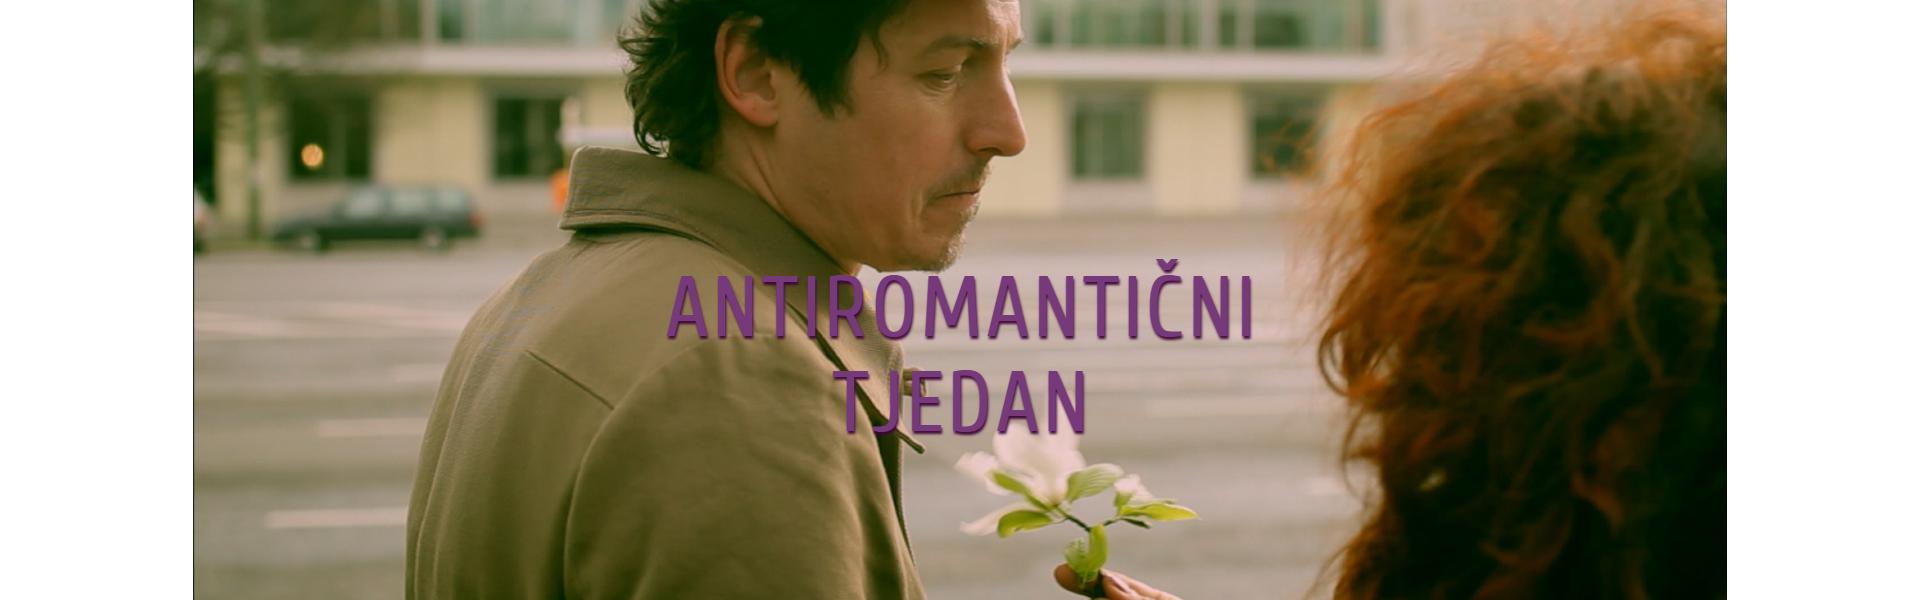 DOK NAS FILM NE RASTAVI – antiromantični tjedan na platformi volimdokumentarce.net